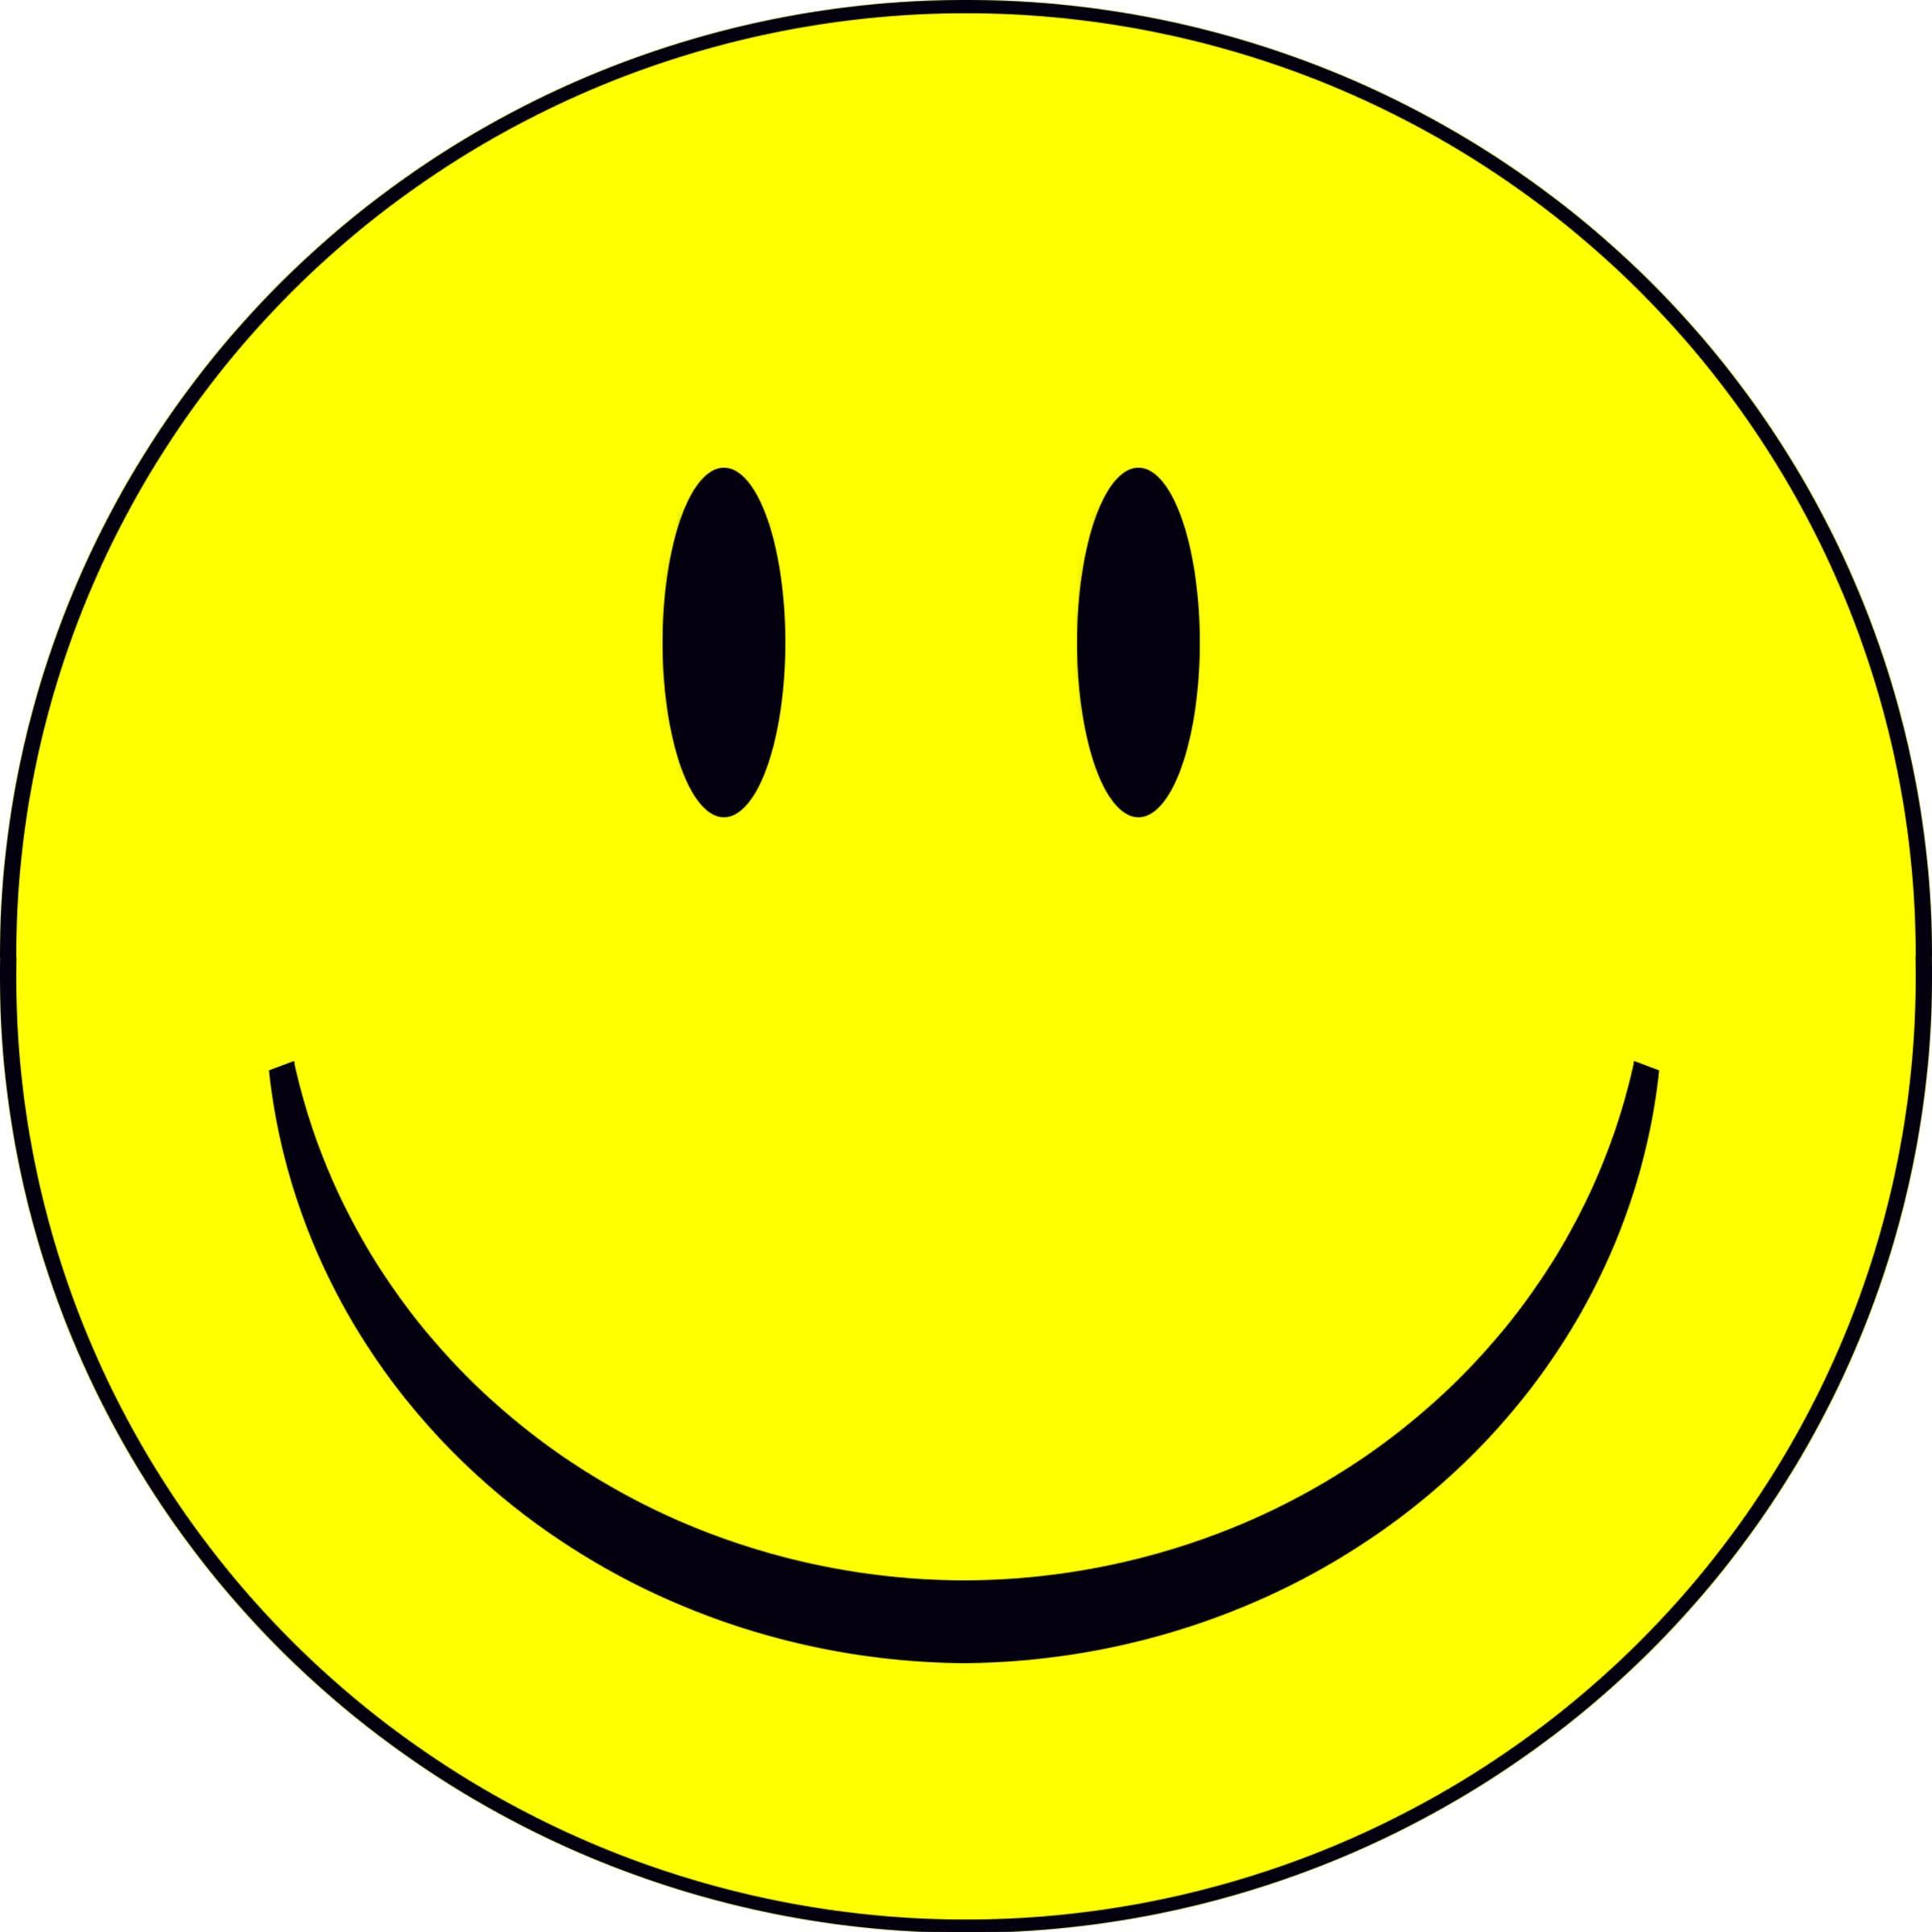 Happy Face Star Clipart .-Happy Face Star Clipart .-6